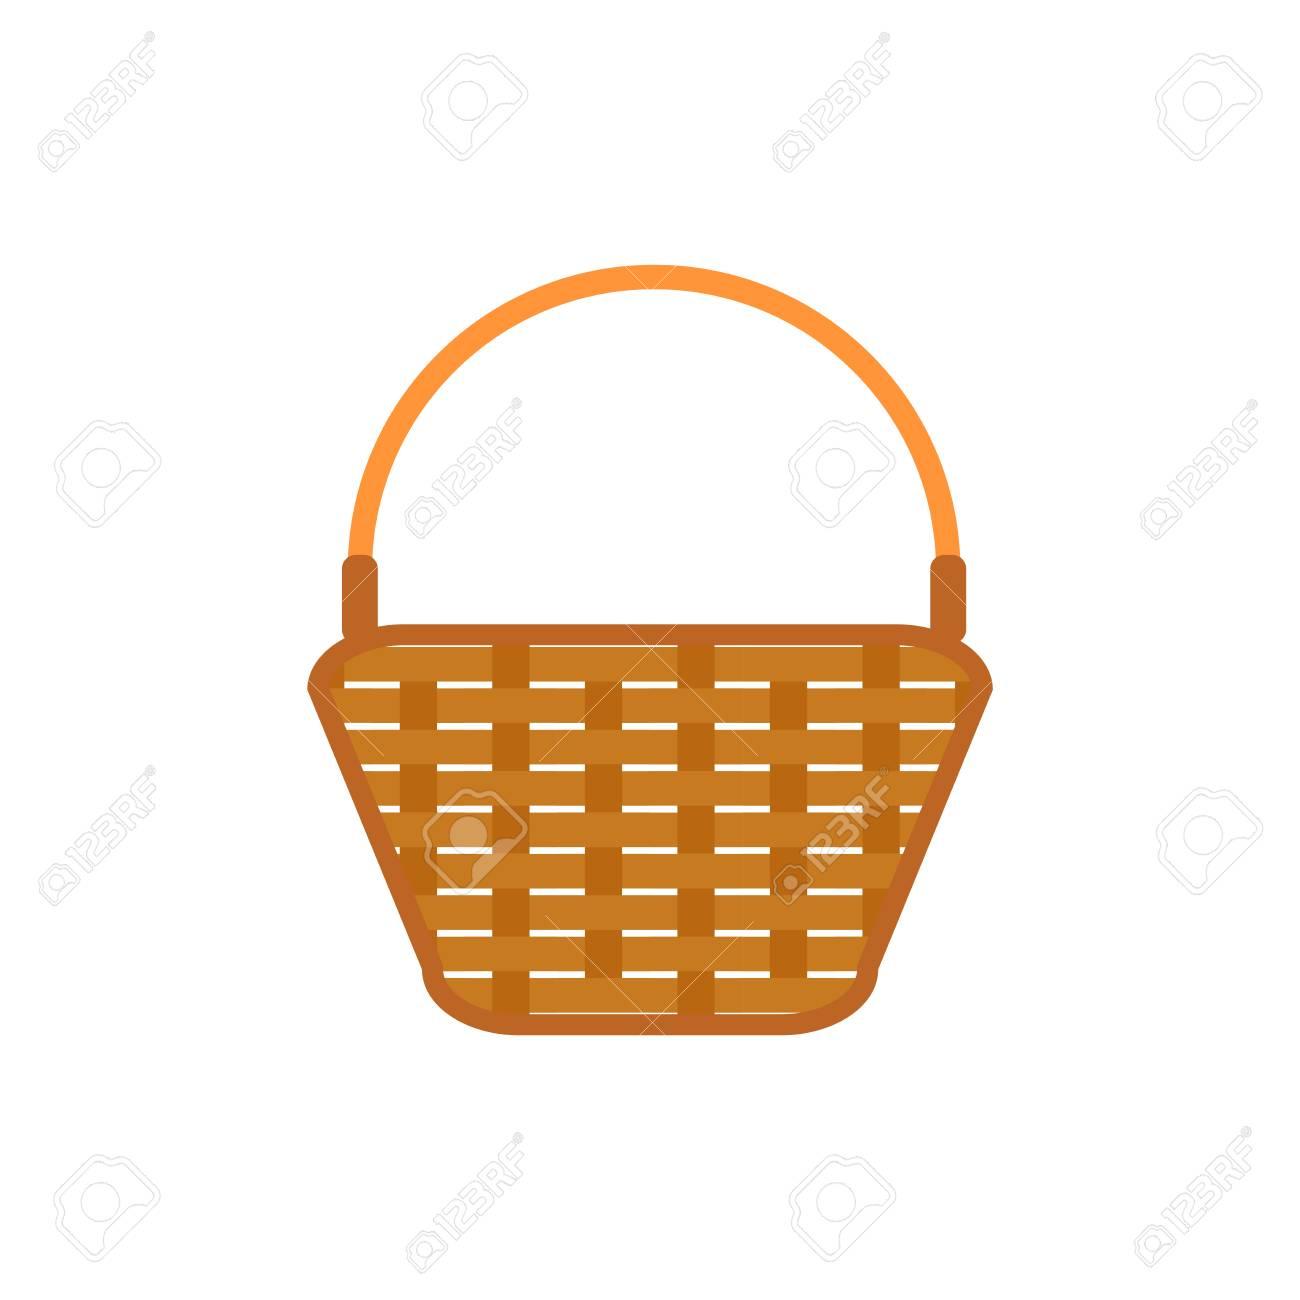 basket icon design Christmas background or Christmas elements isolate on white background vector illustration - 113126736